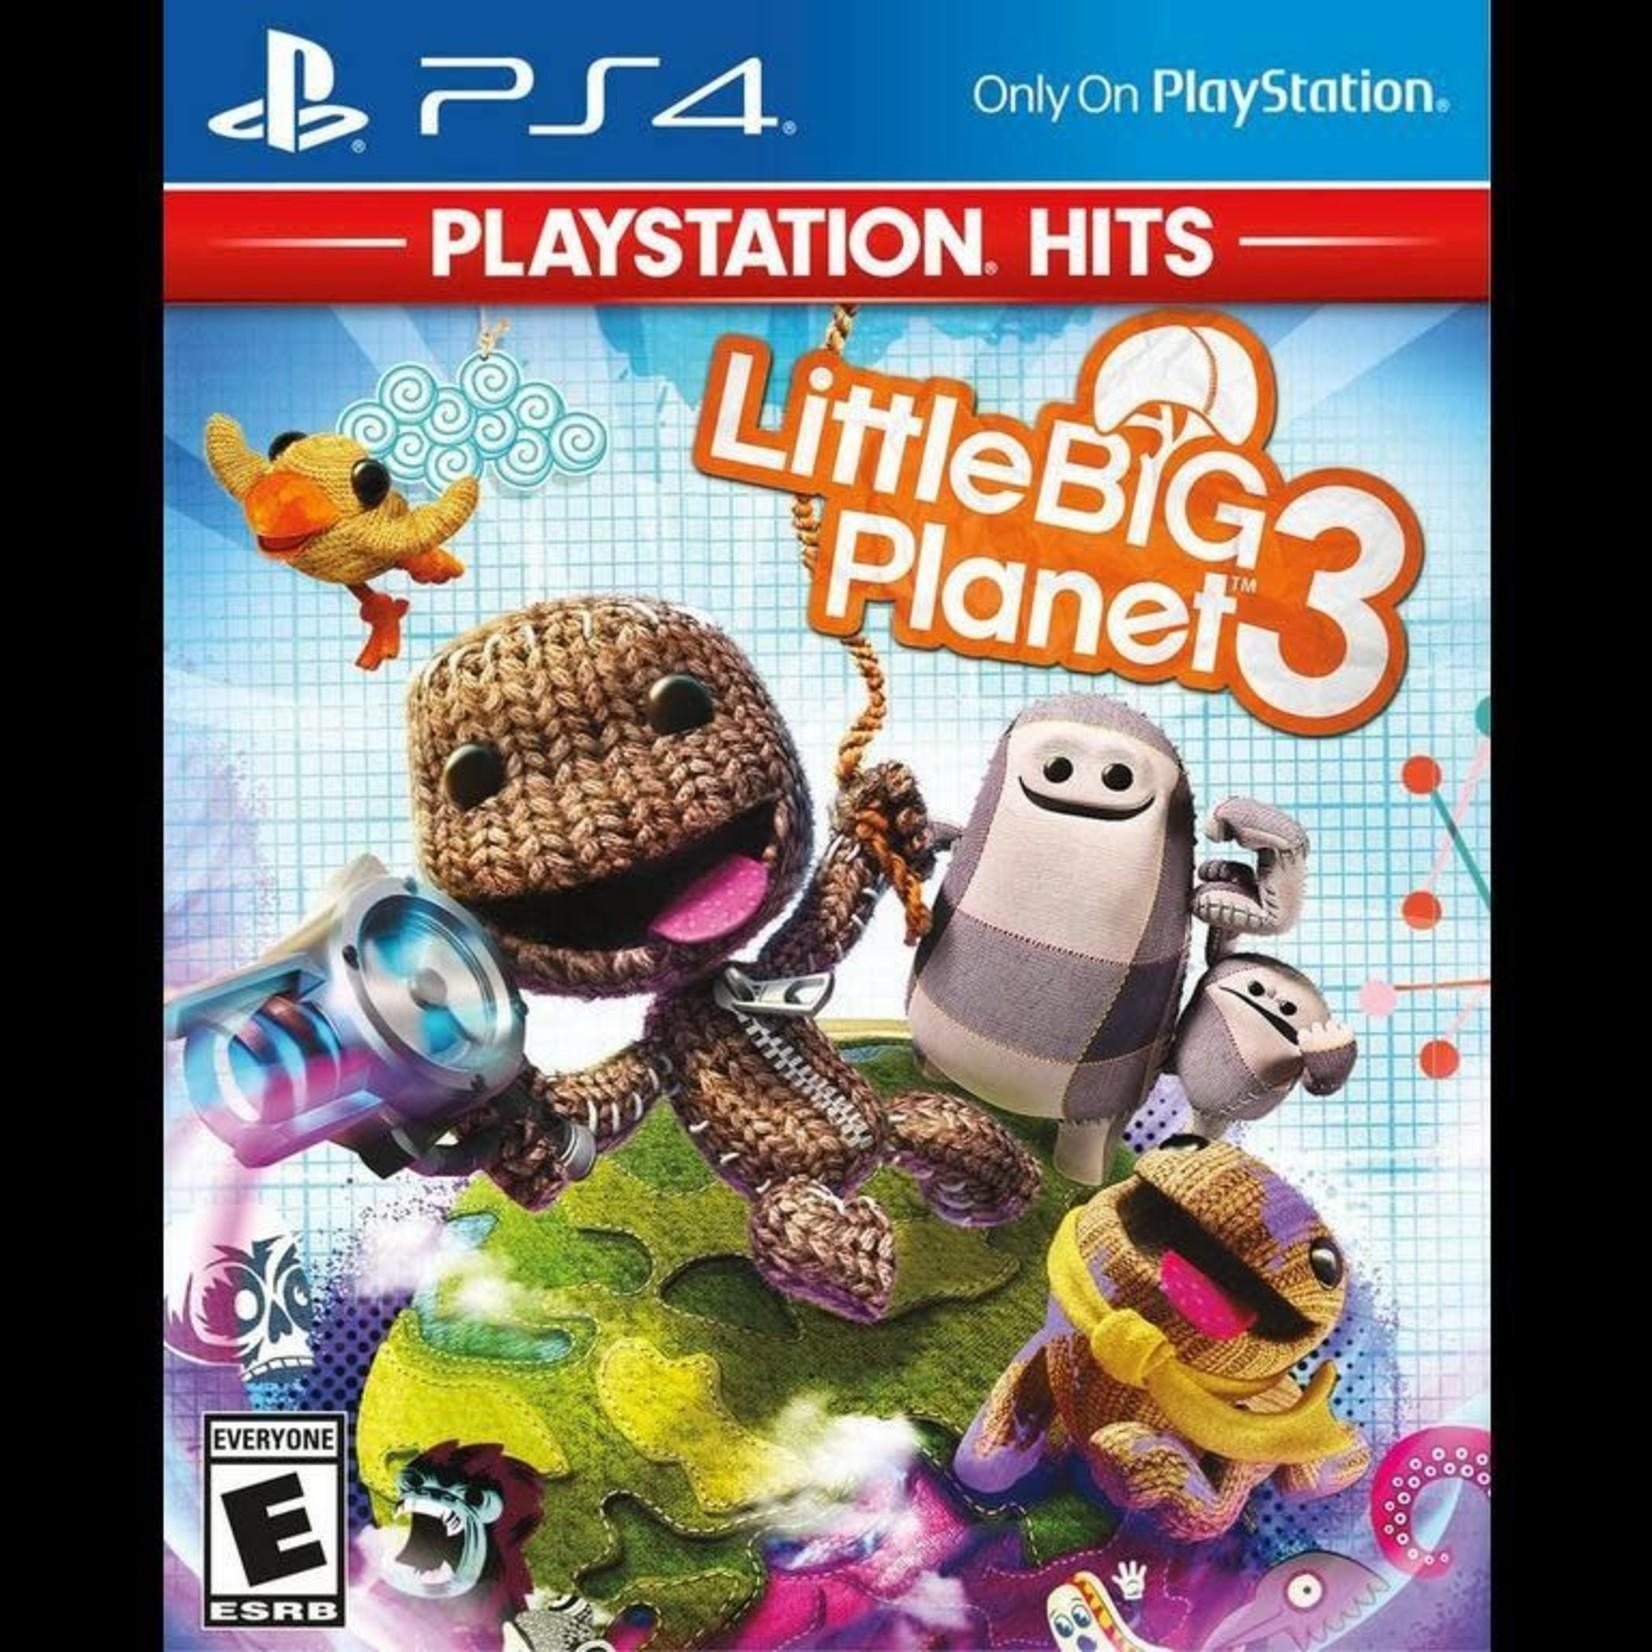 PS4U-LITTLEBIGPLANET 3